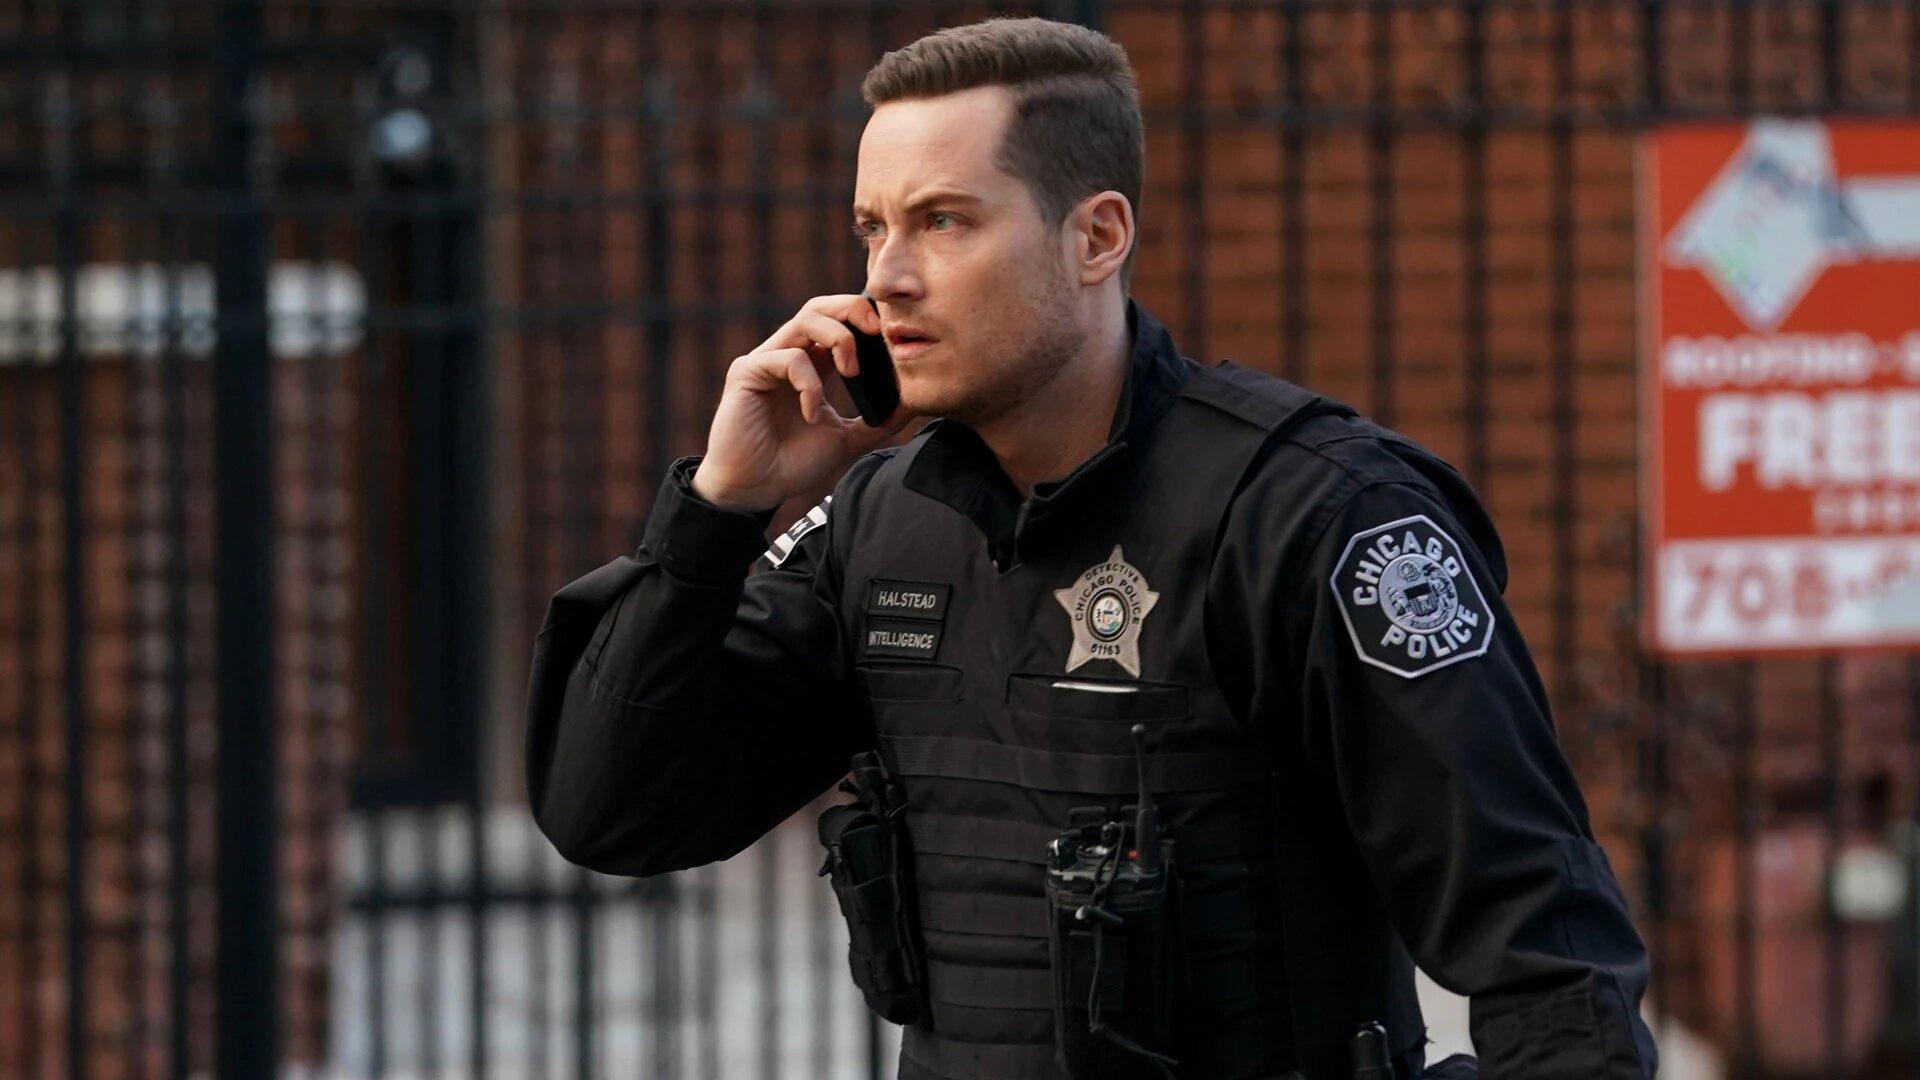 Полиция Чикаго — s08e16 — The Other Side